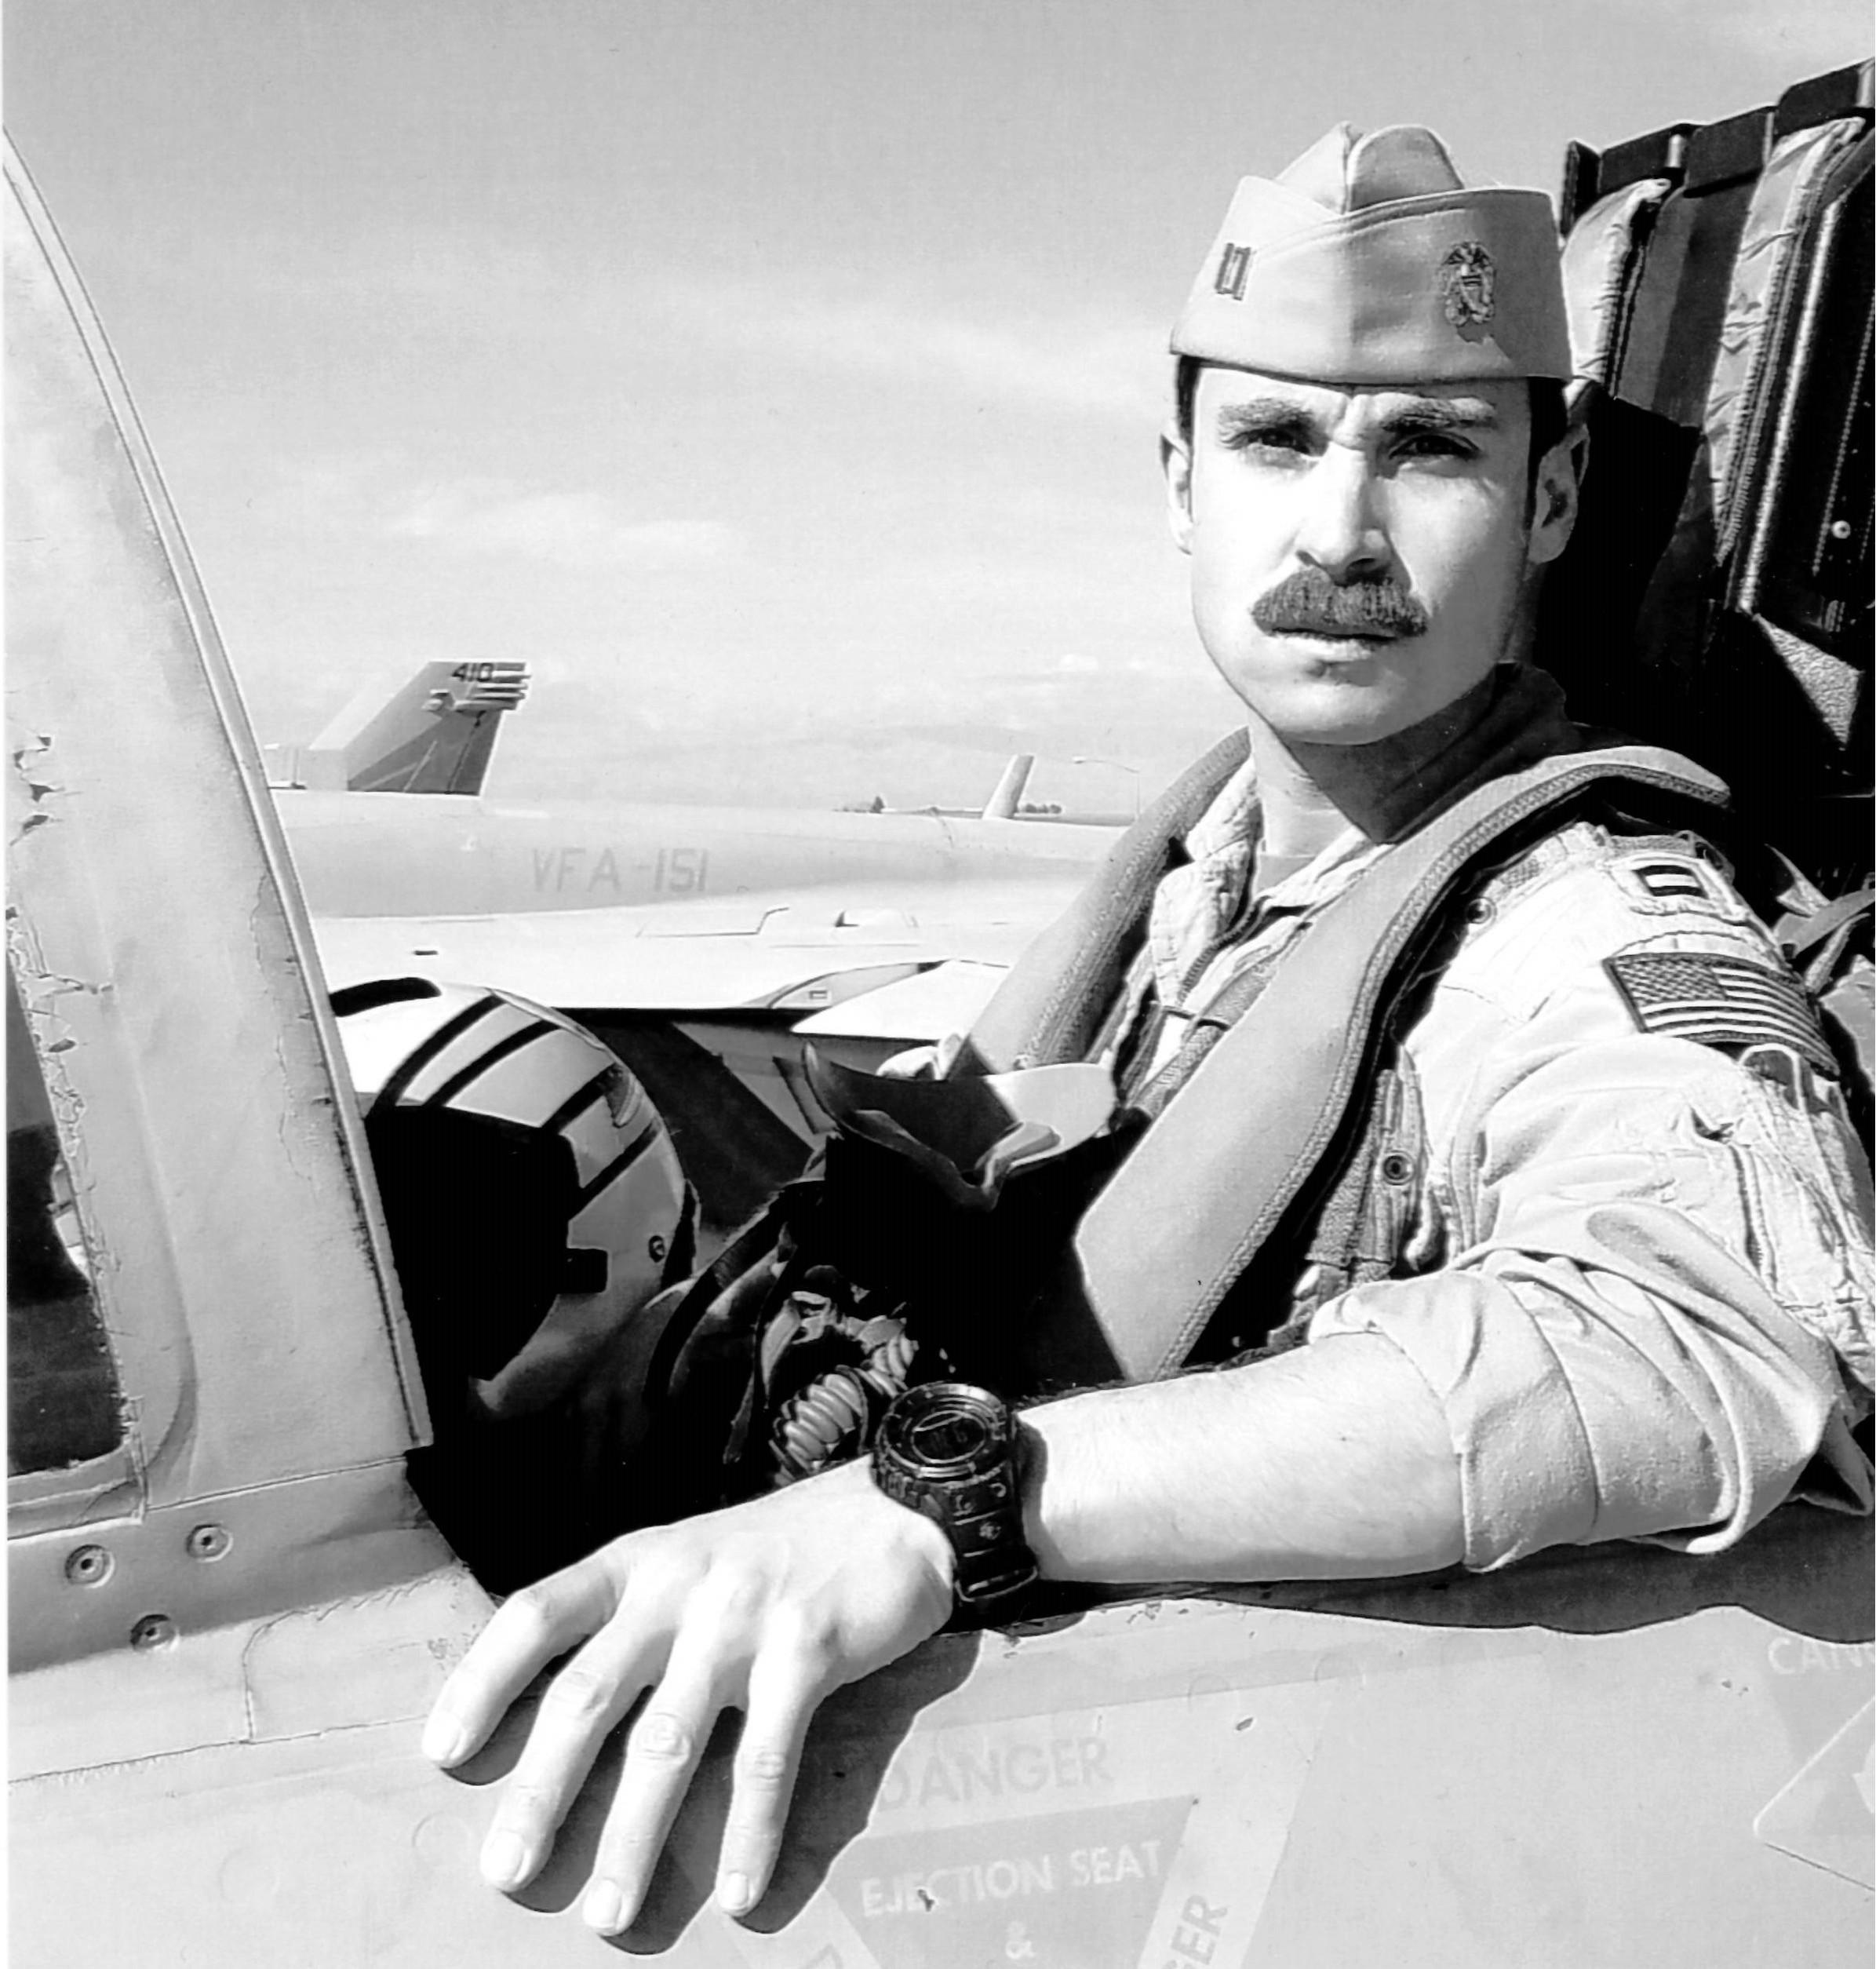 Navy Identifies Pilot Killed in Death Valley Super Hornet Crash - USNI News